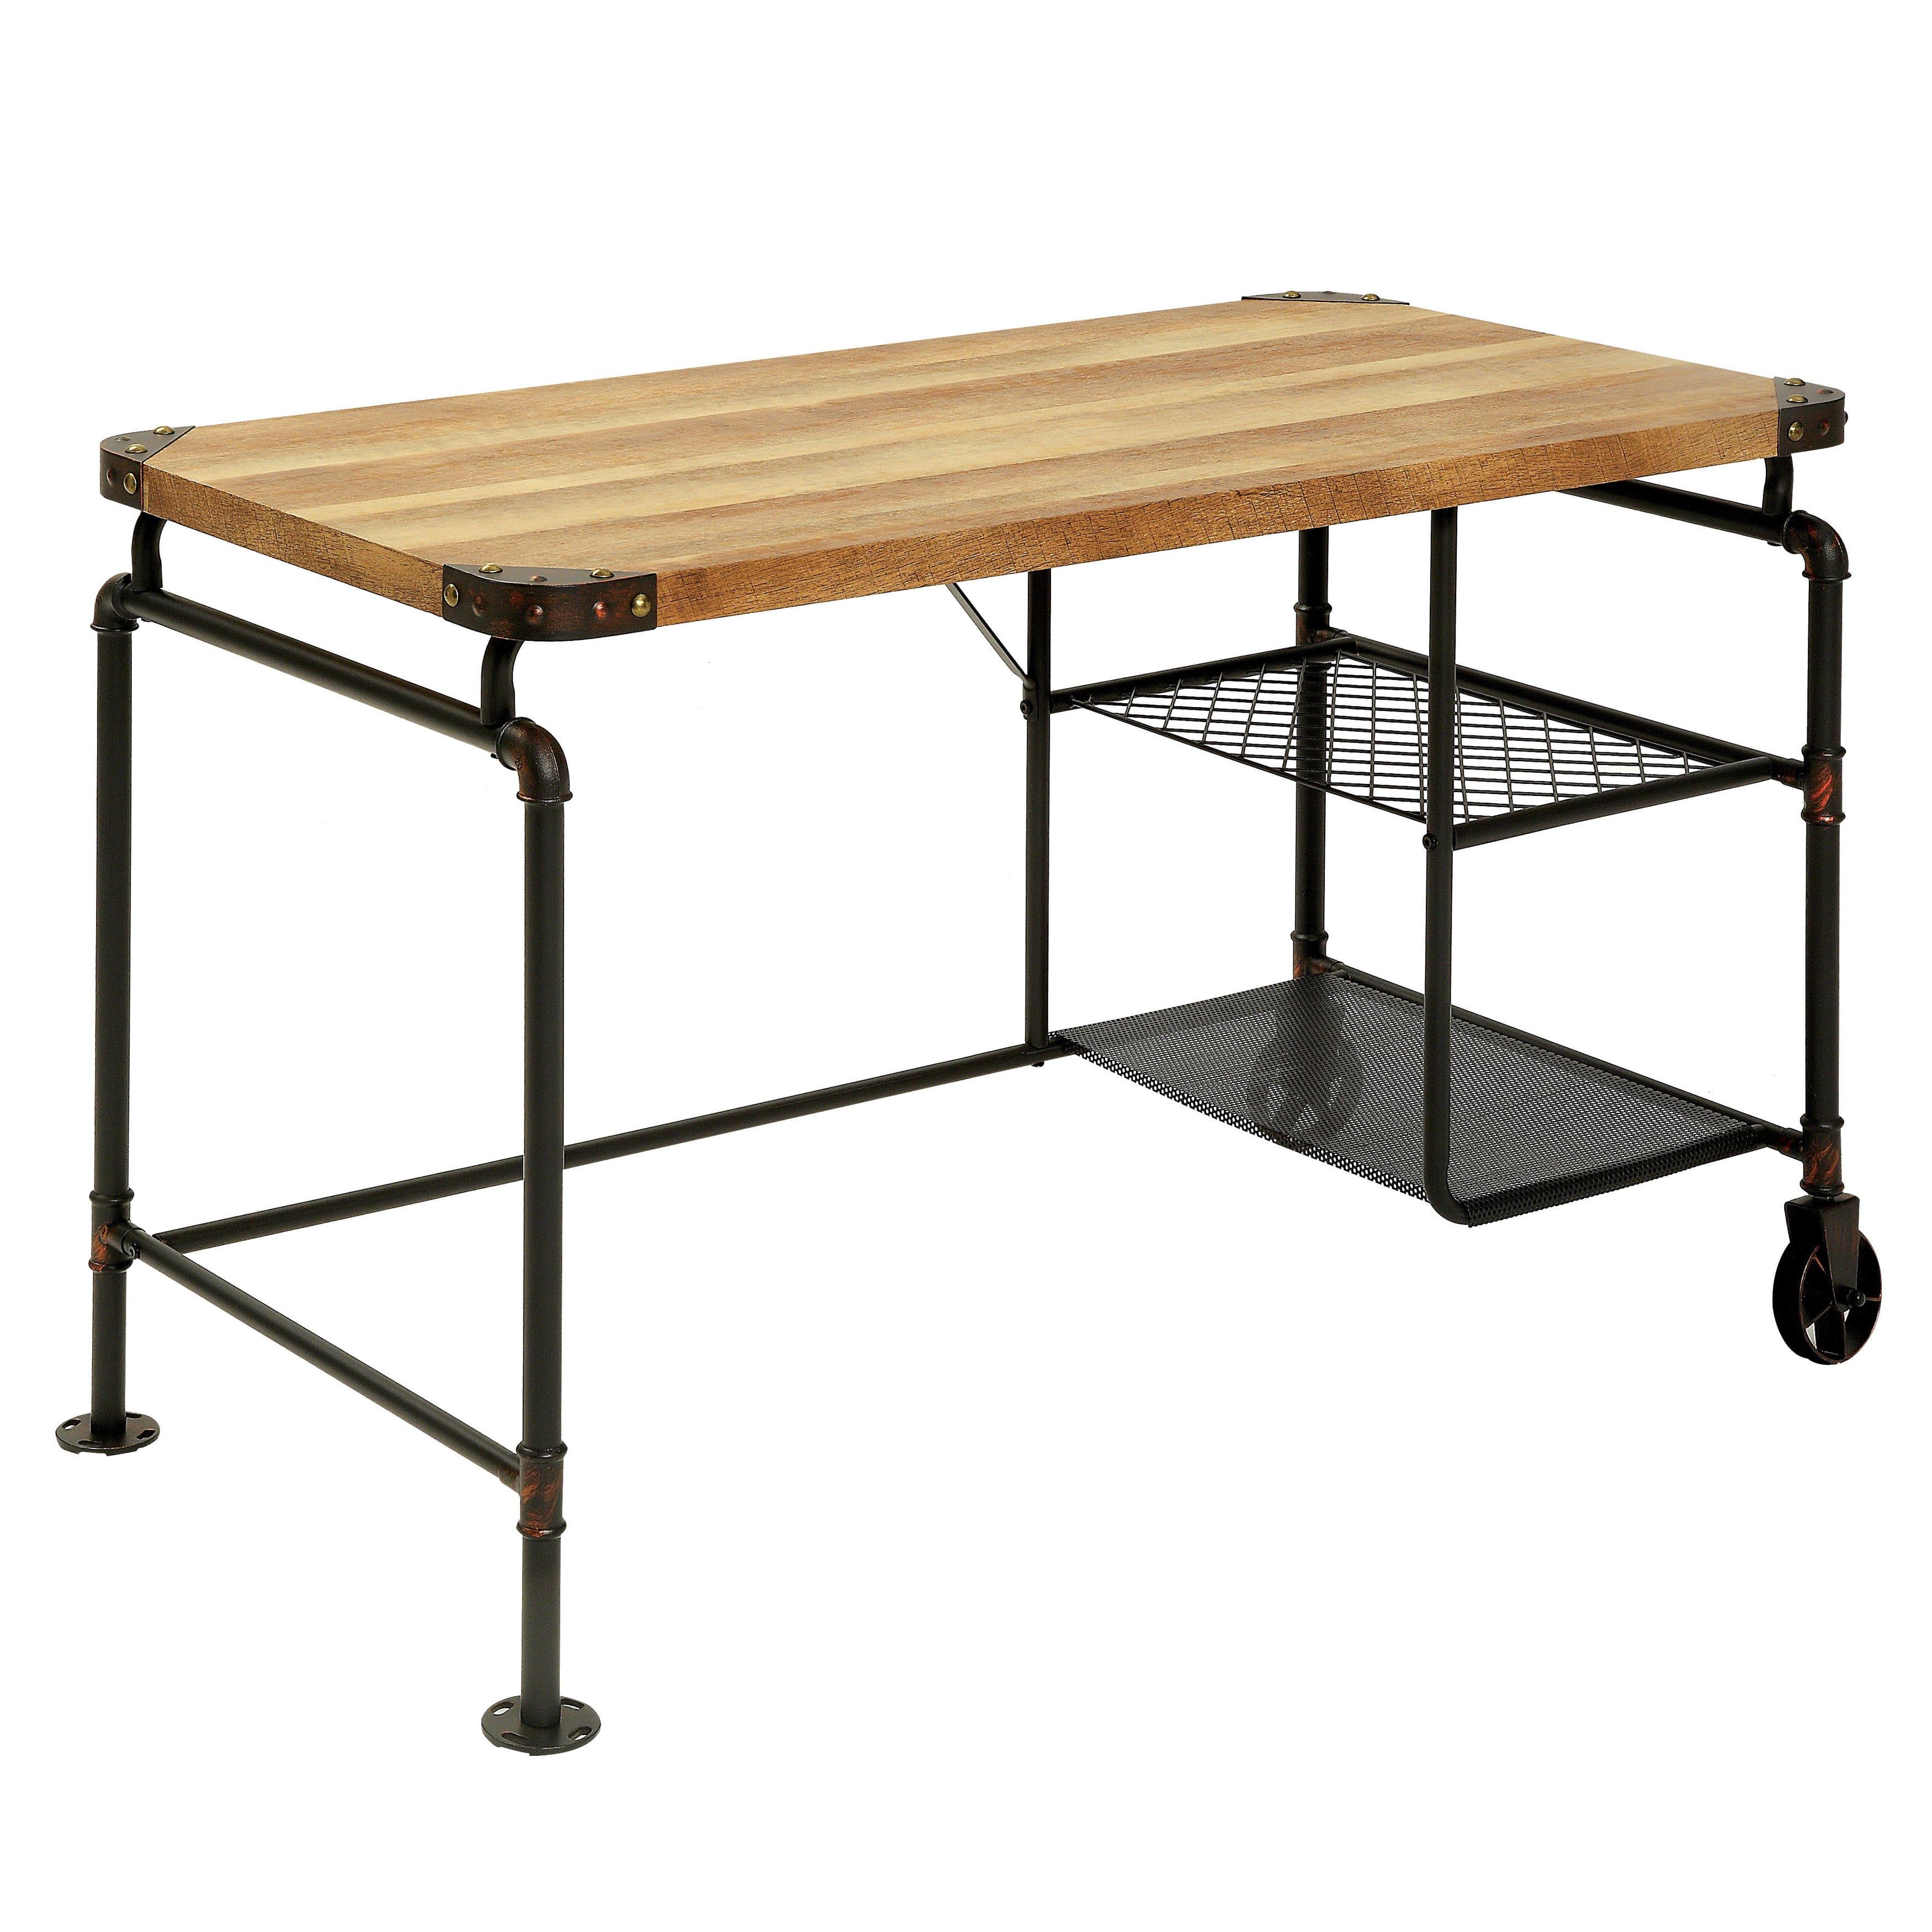 Desks Amp Computer Tables For Less Overstock Com